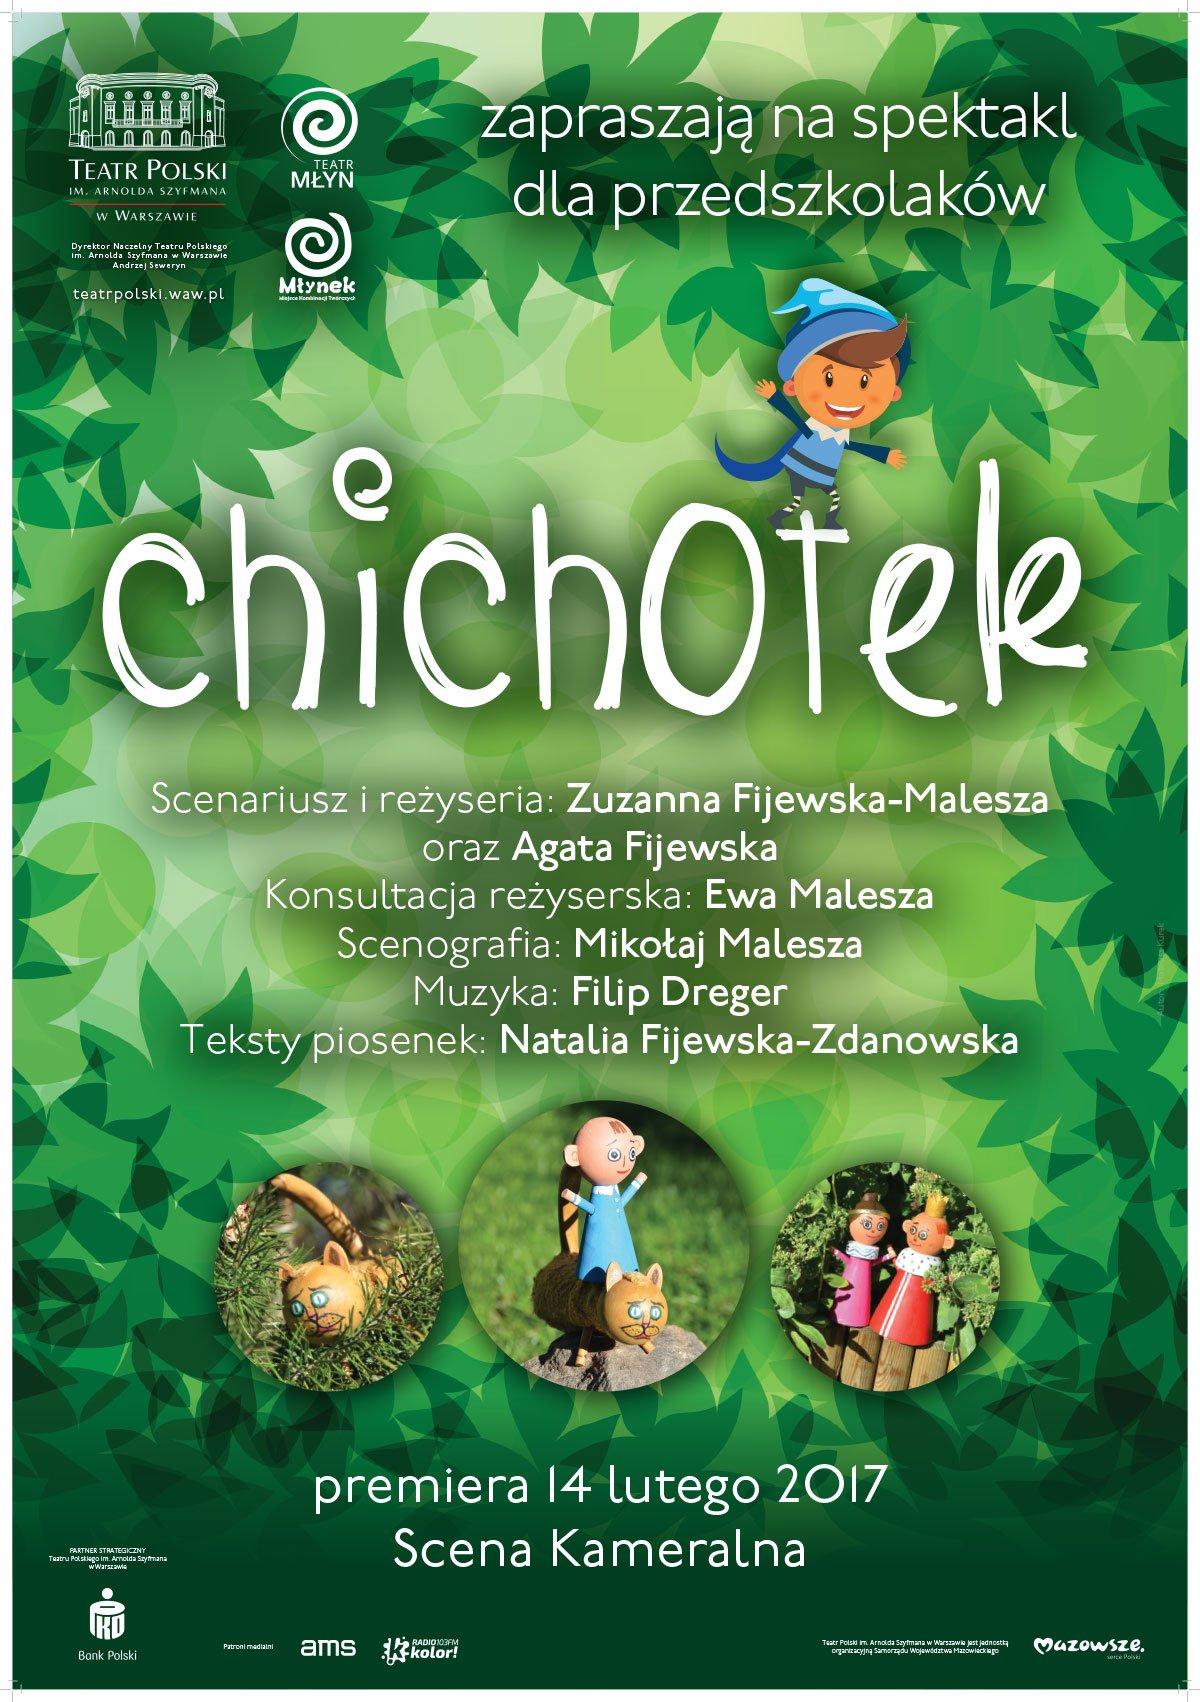 Chochotek teatr Polski